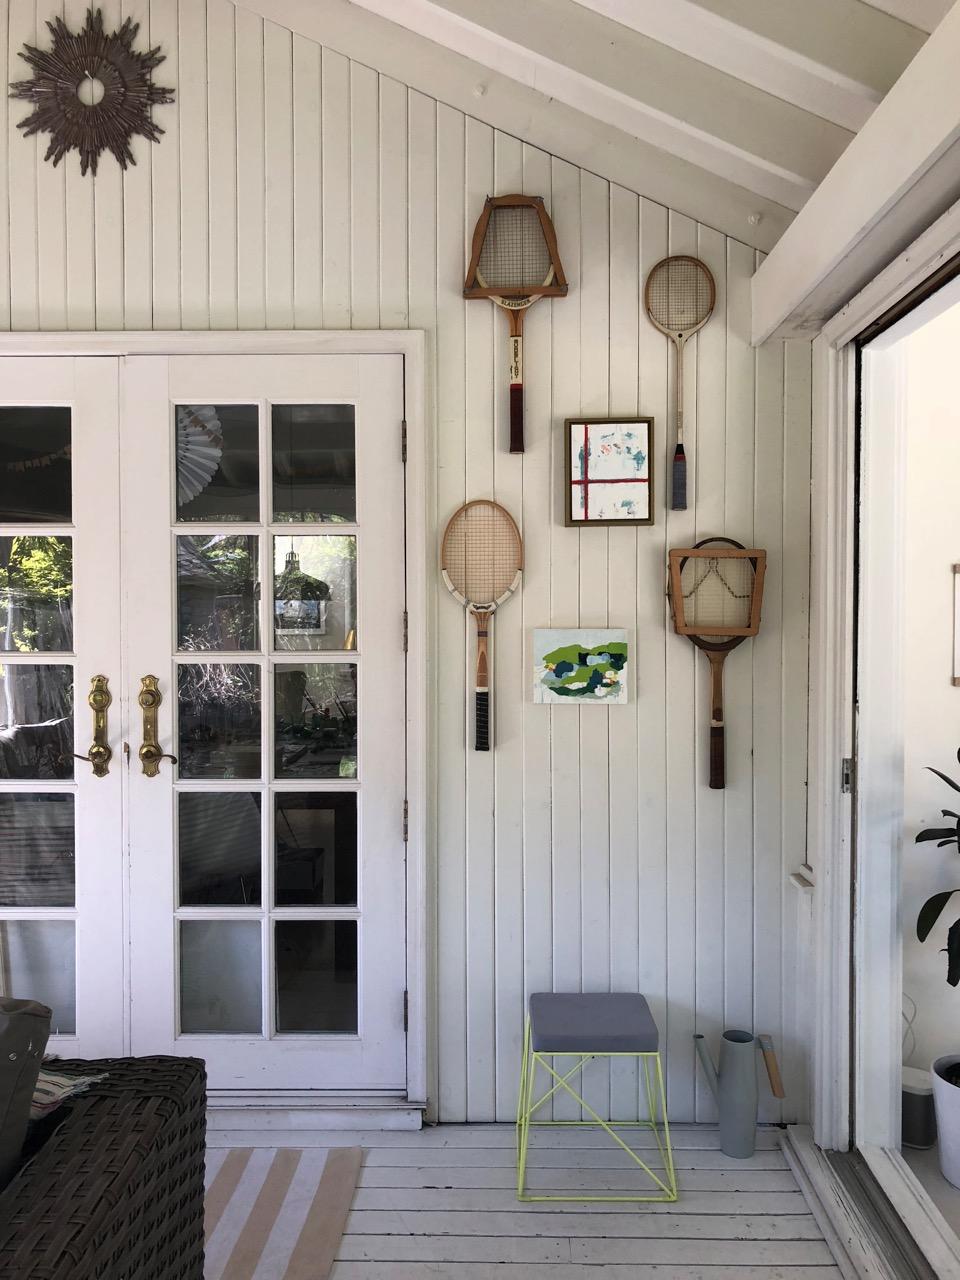 "Top:  Borderlines , 2017 oil on cradled wood panel. Bottom:  Compass XIII , 2018 8 x 10"" oil on cradled wood panel."